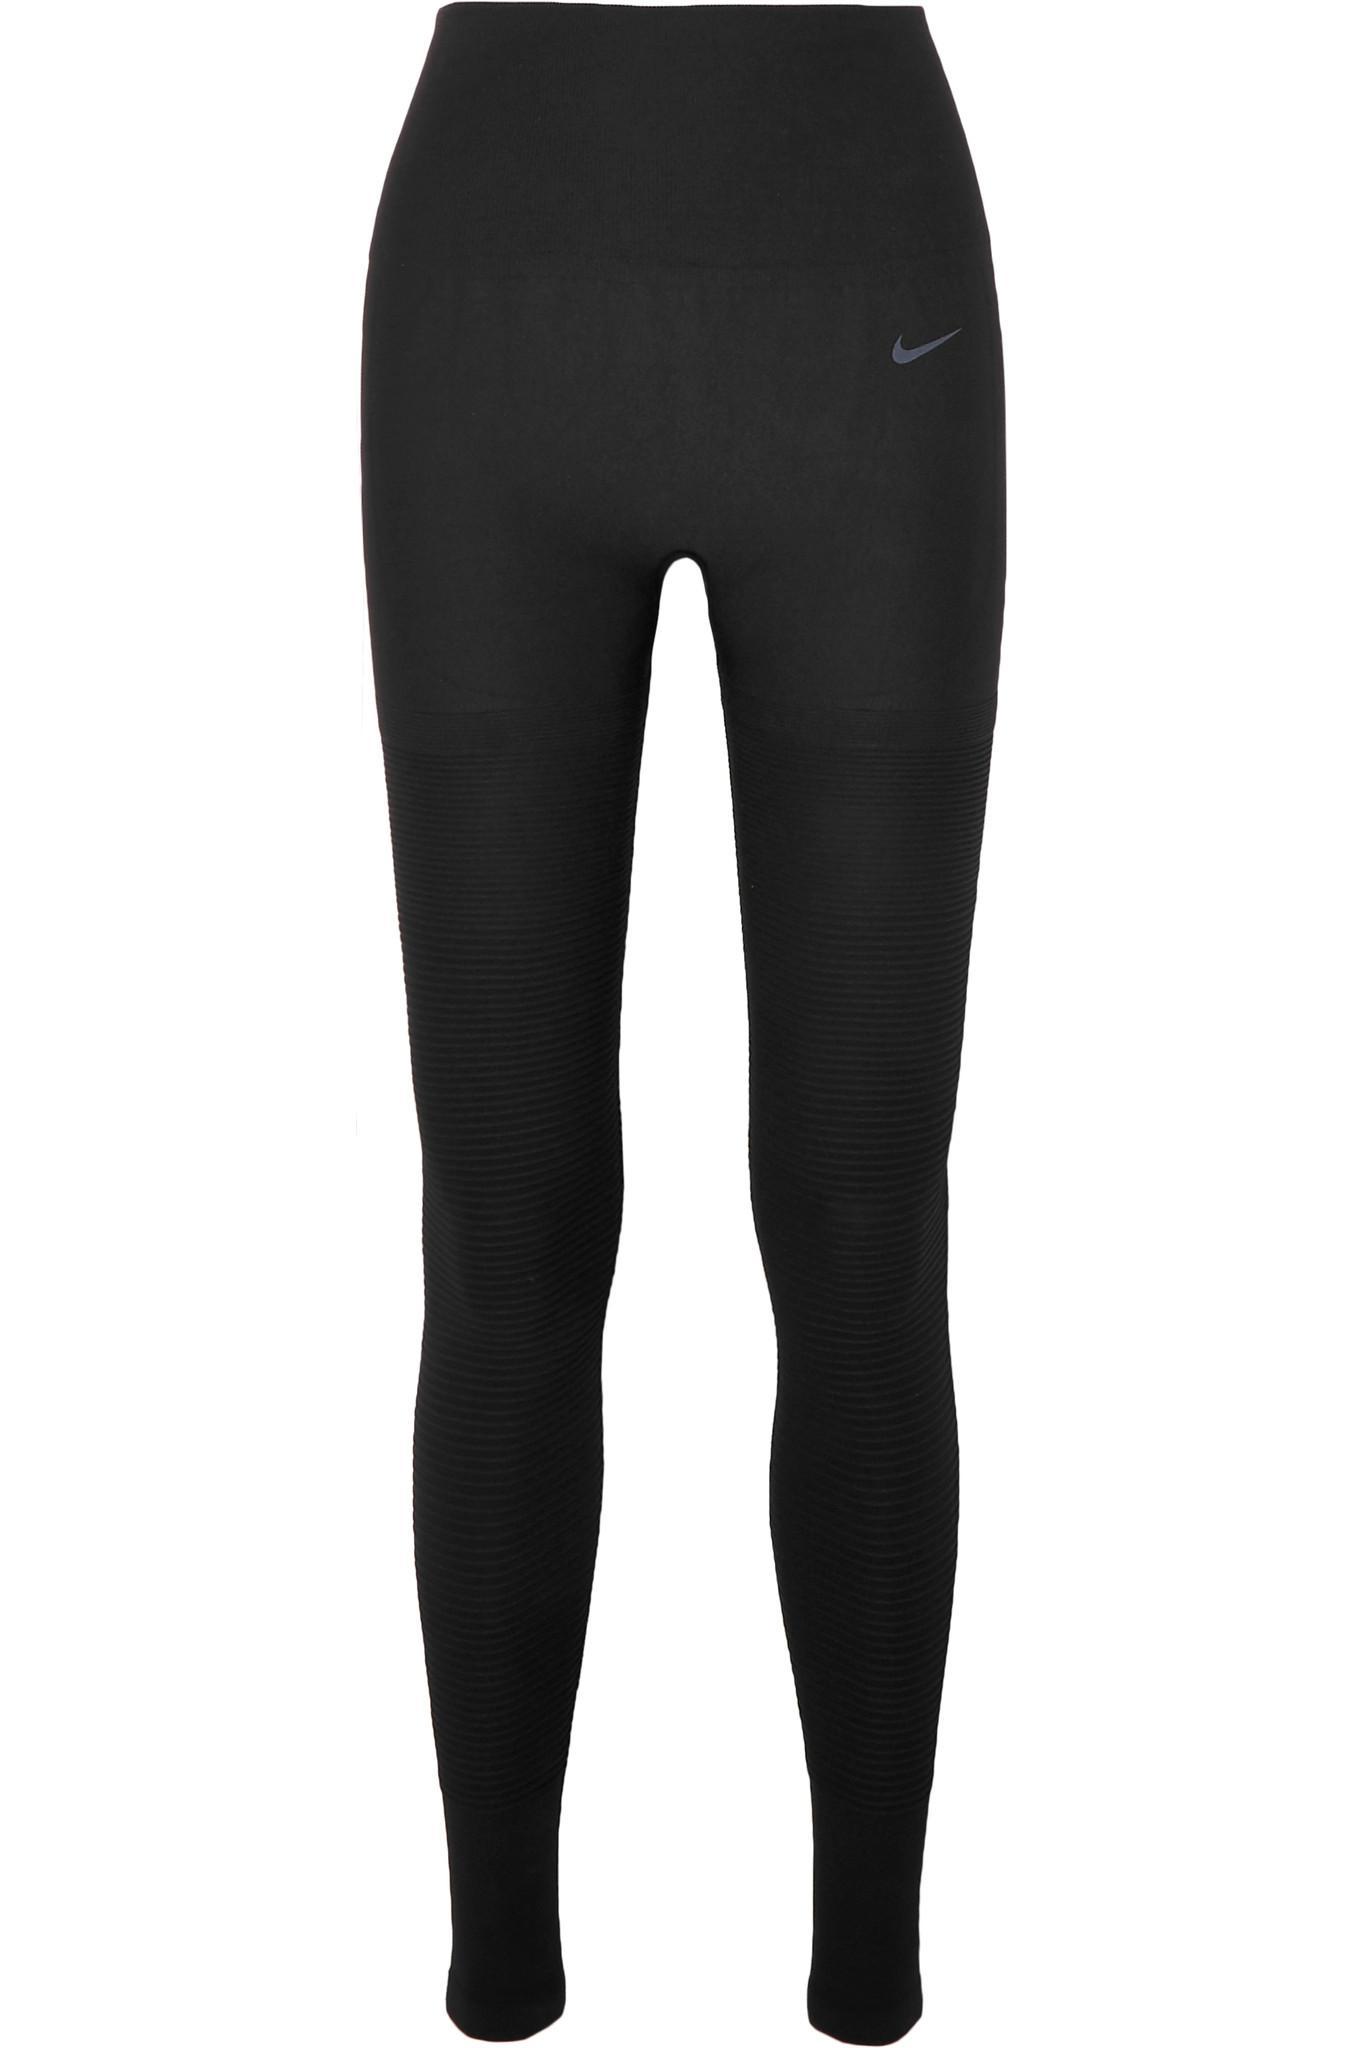 3407521b2d9a4a Nike Sculpt Lux Ribbed Leggings in Black - Lyst